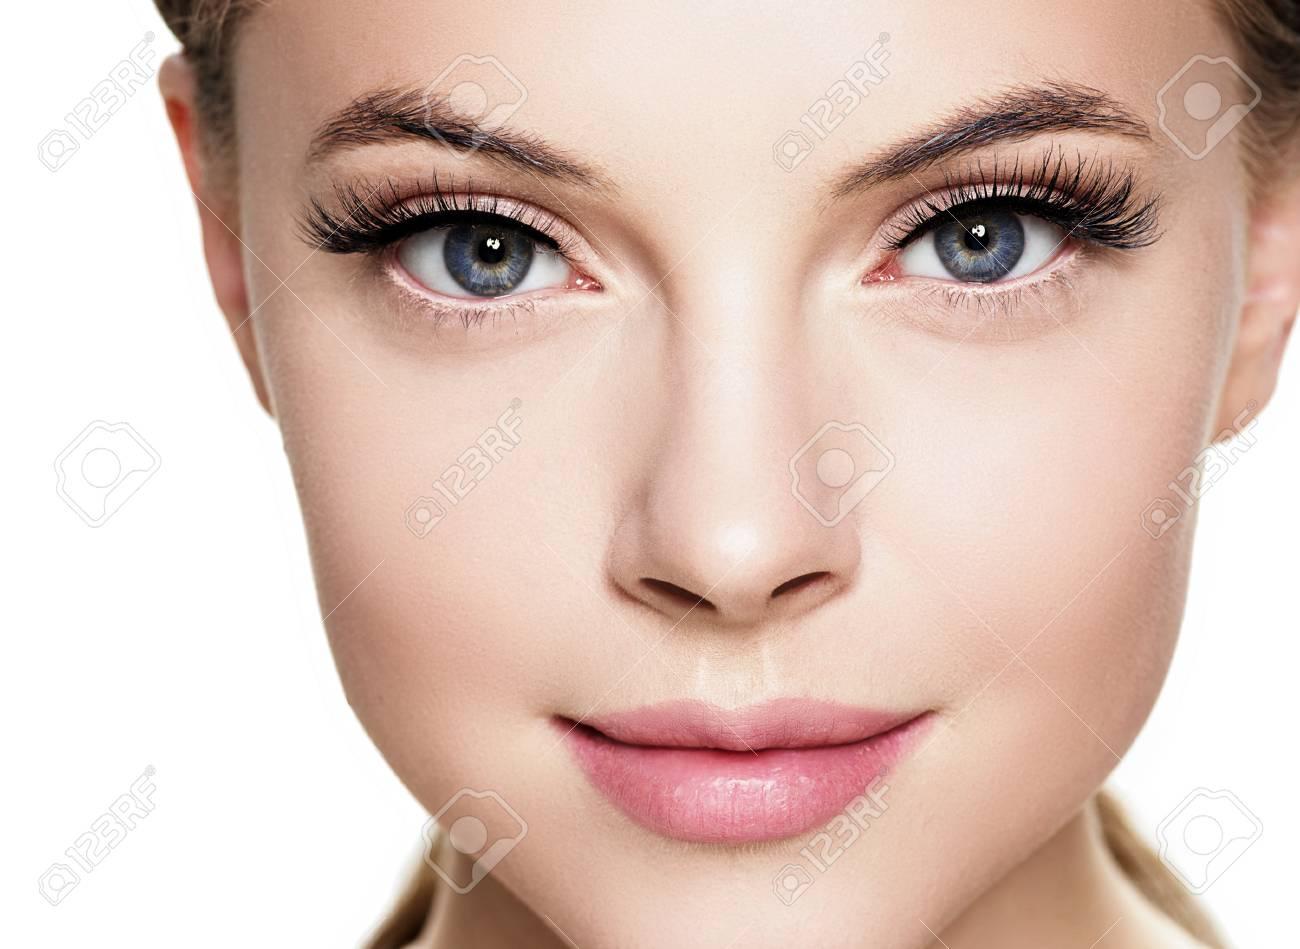 Beautiful woman face with eyelashes beauty healthy skin natural makeup. Studio shot. - 115672425